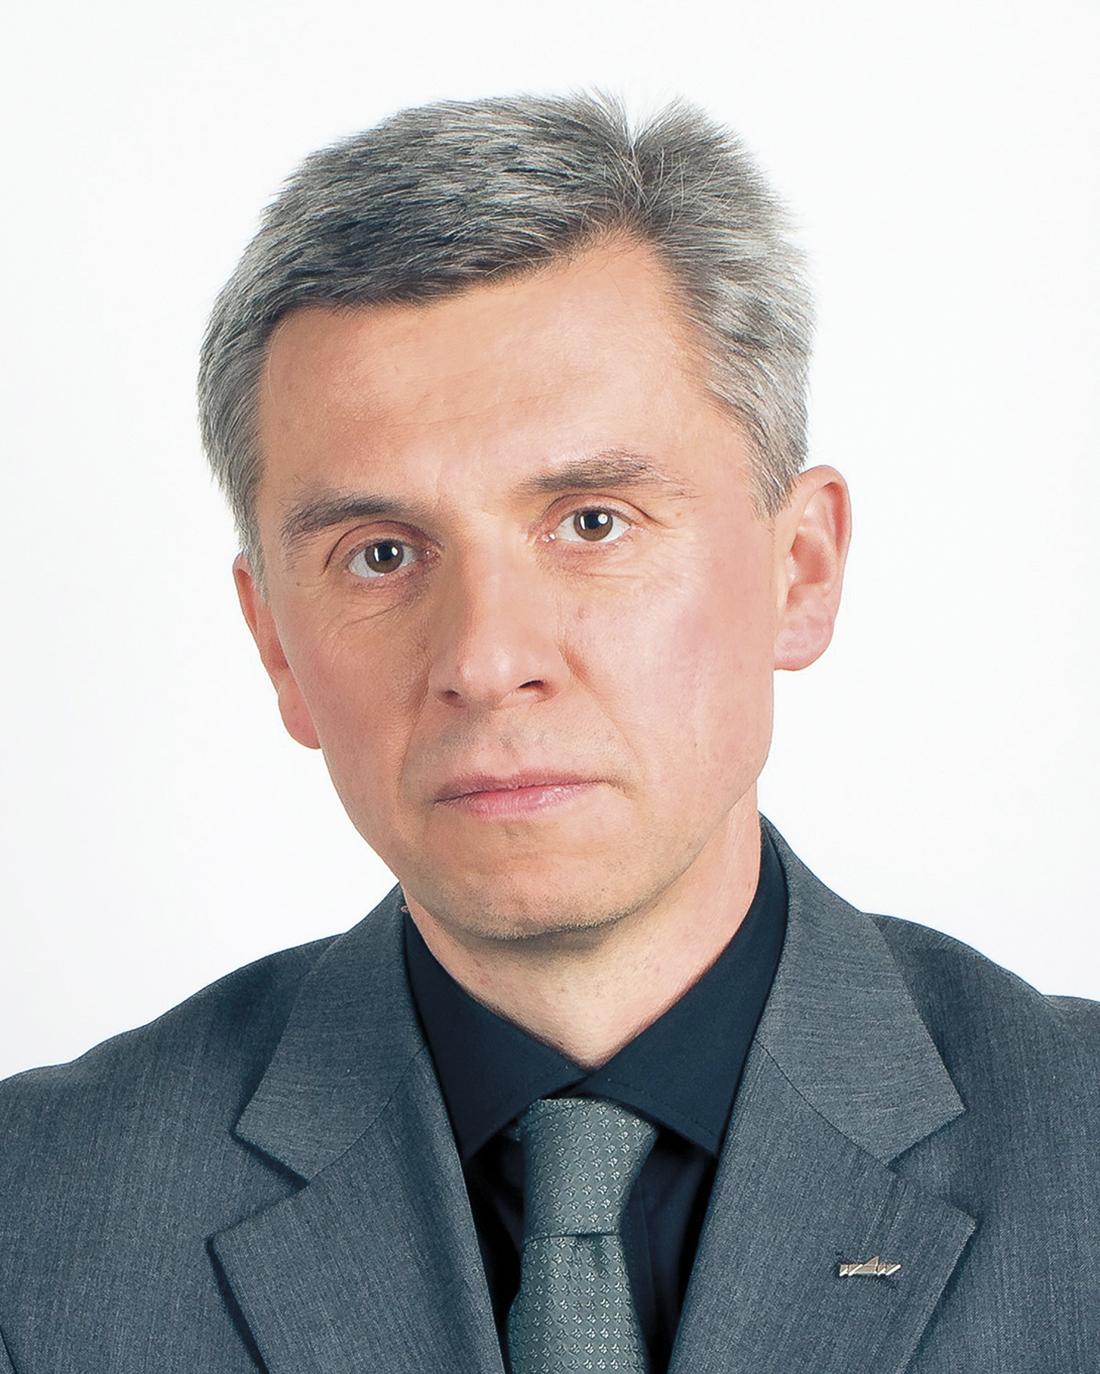 Jan Słyk